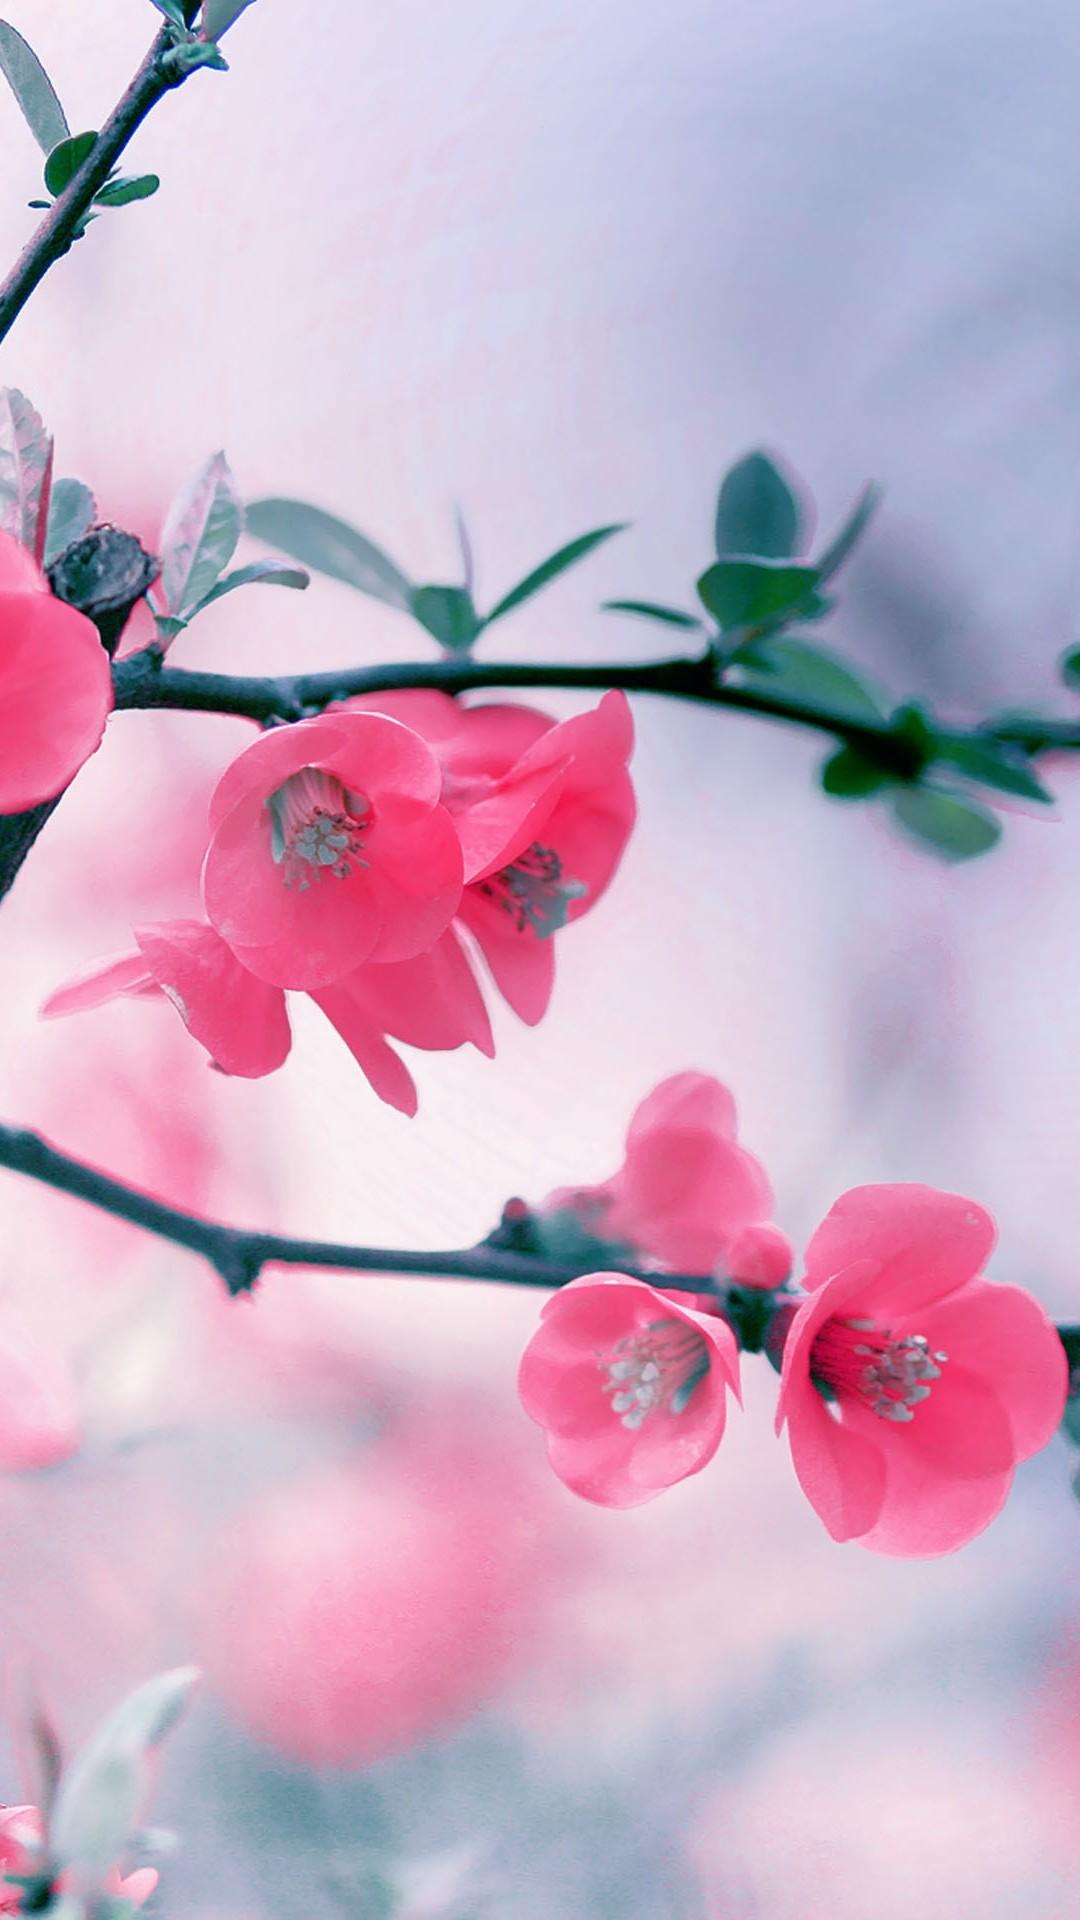 Download Free Cool Pink Iphone Wallpaper.